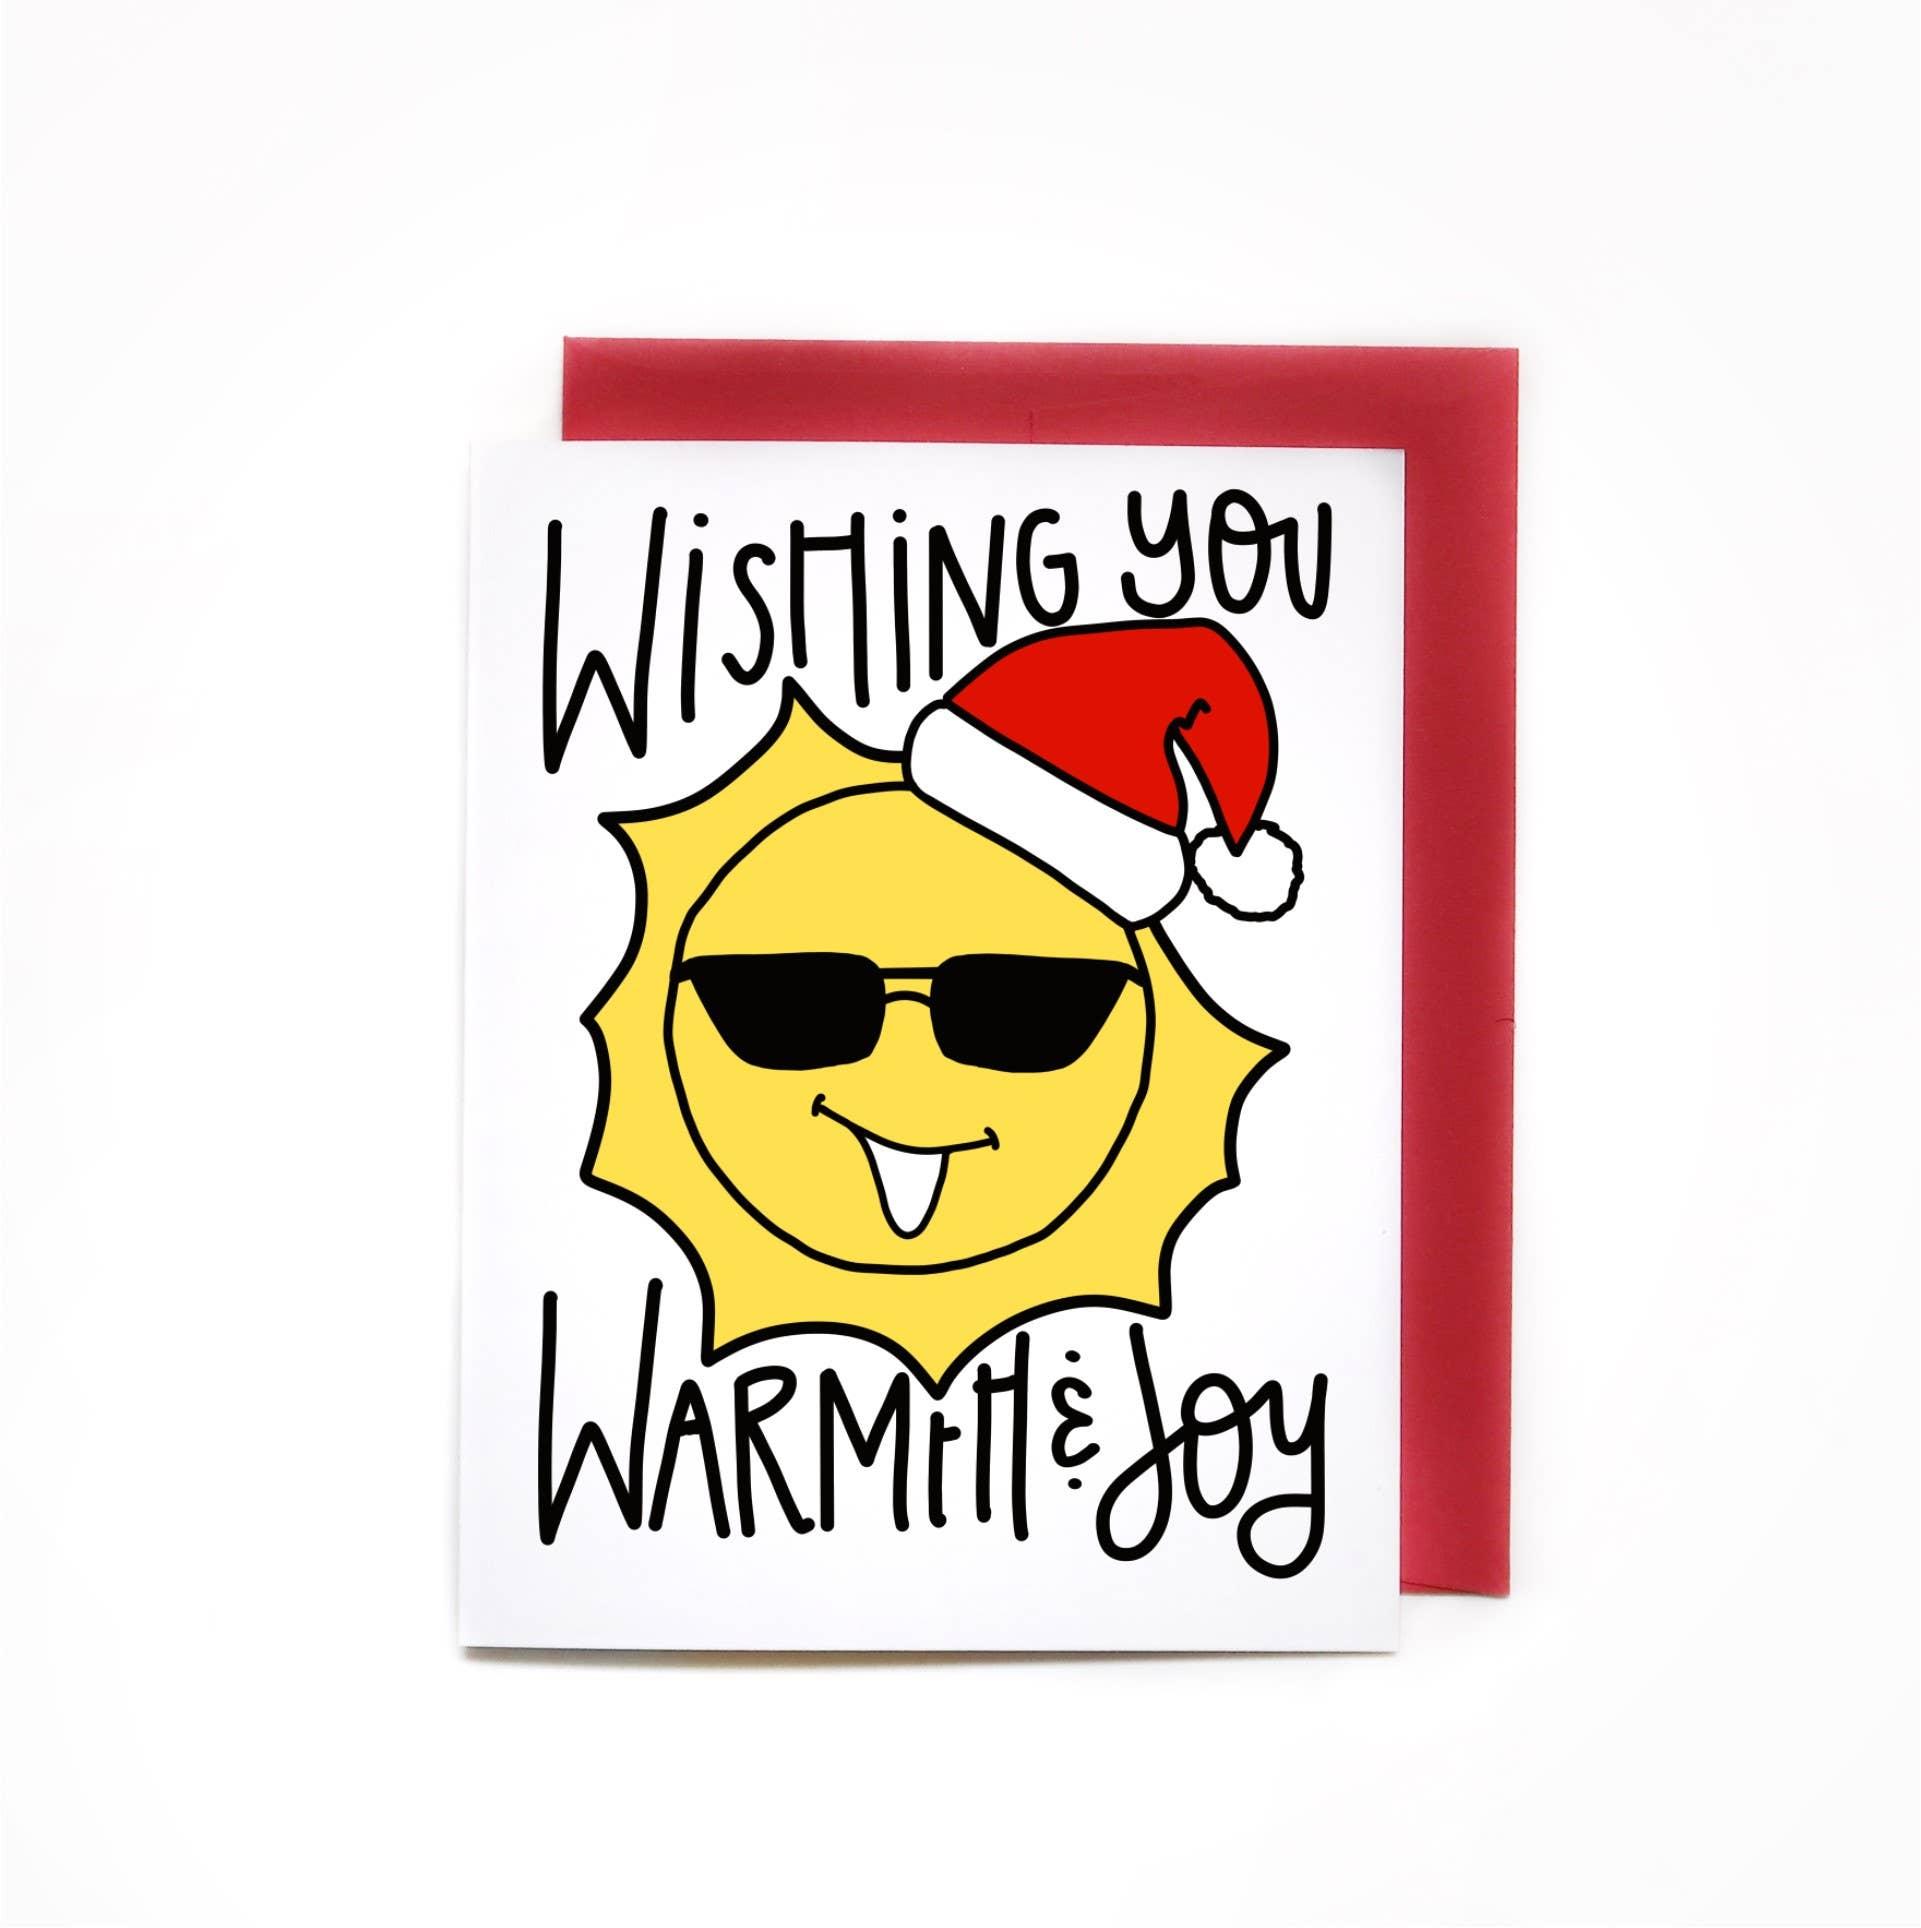 Wishing You Warmth and Joy - Sunny Holiday Card | Trada Marketplace